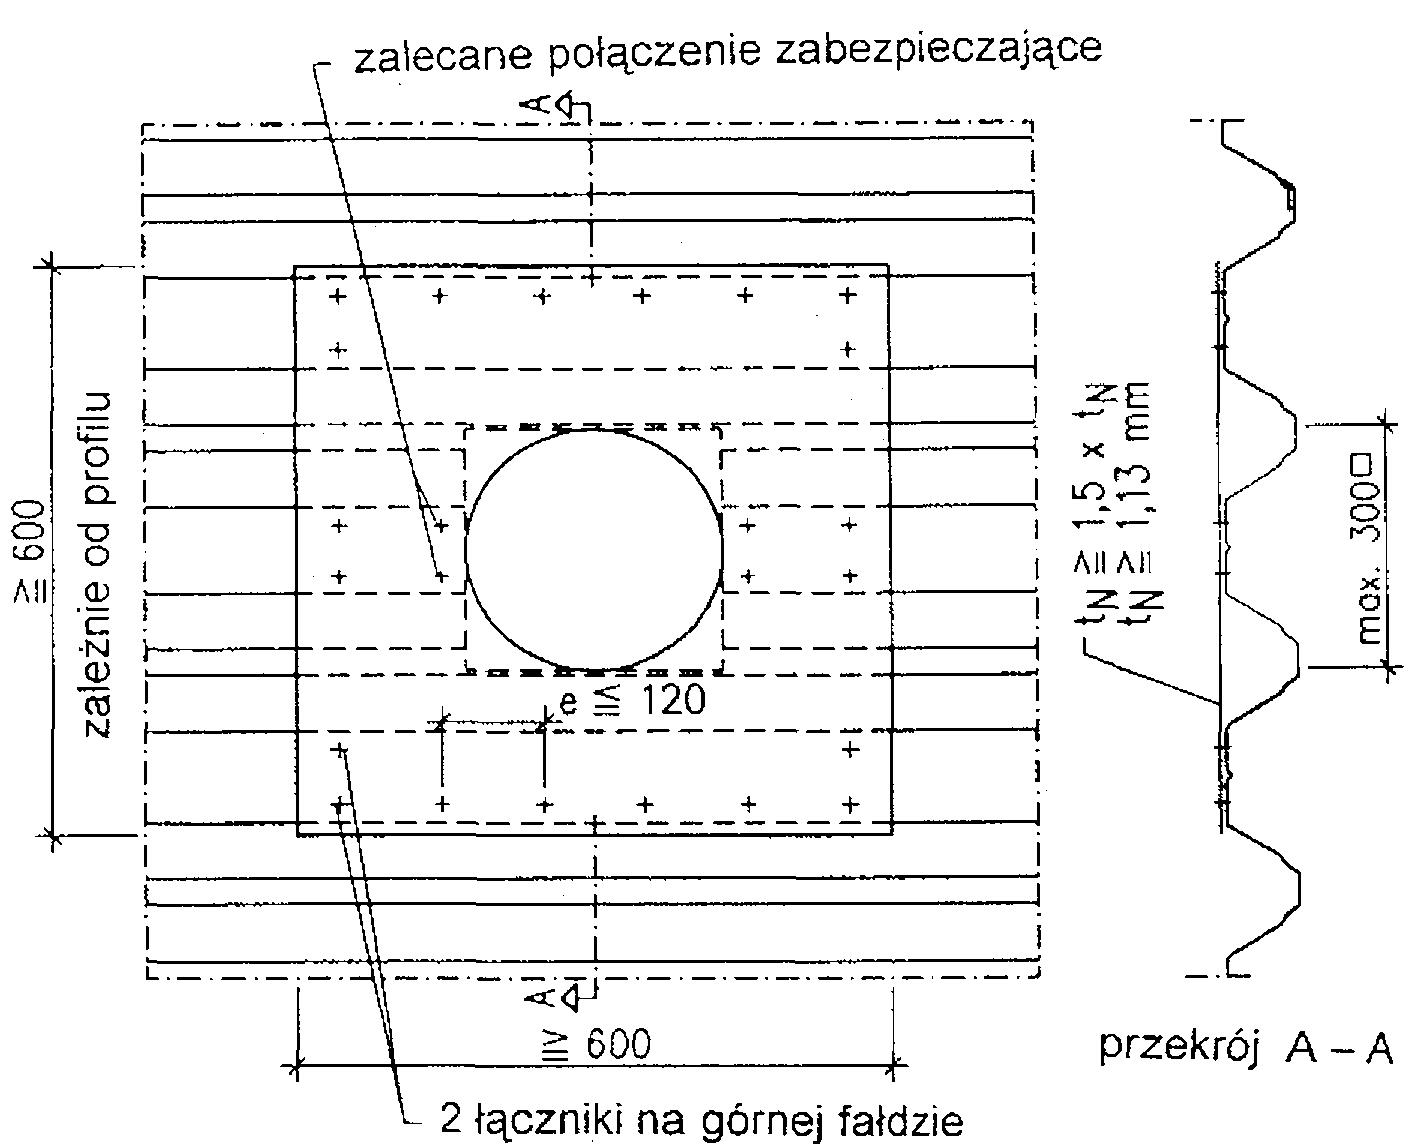 tmpeca8-1